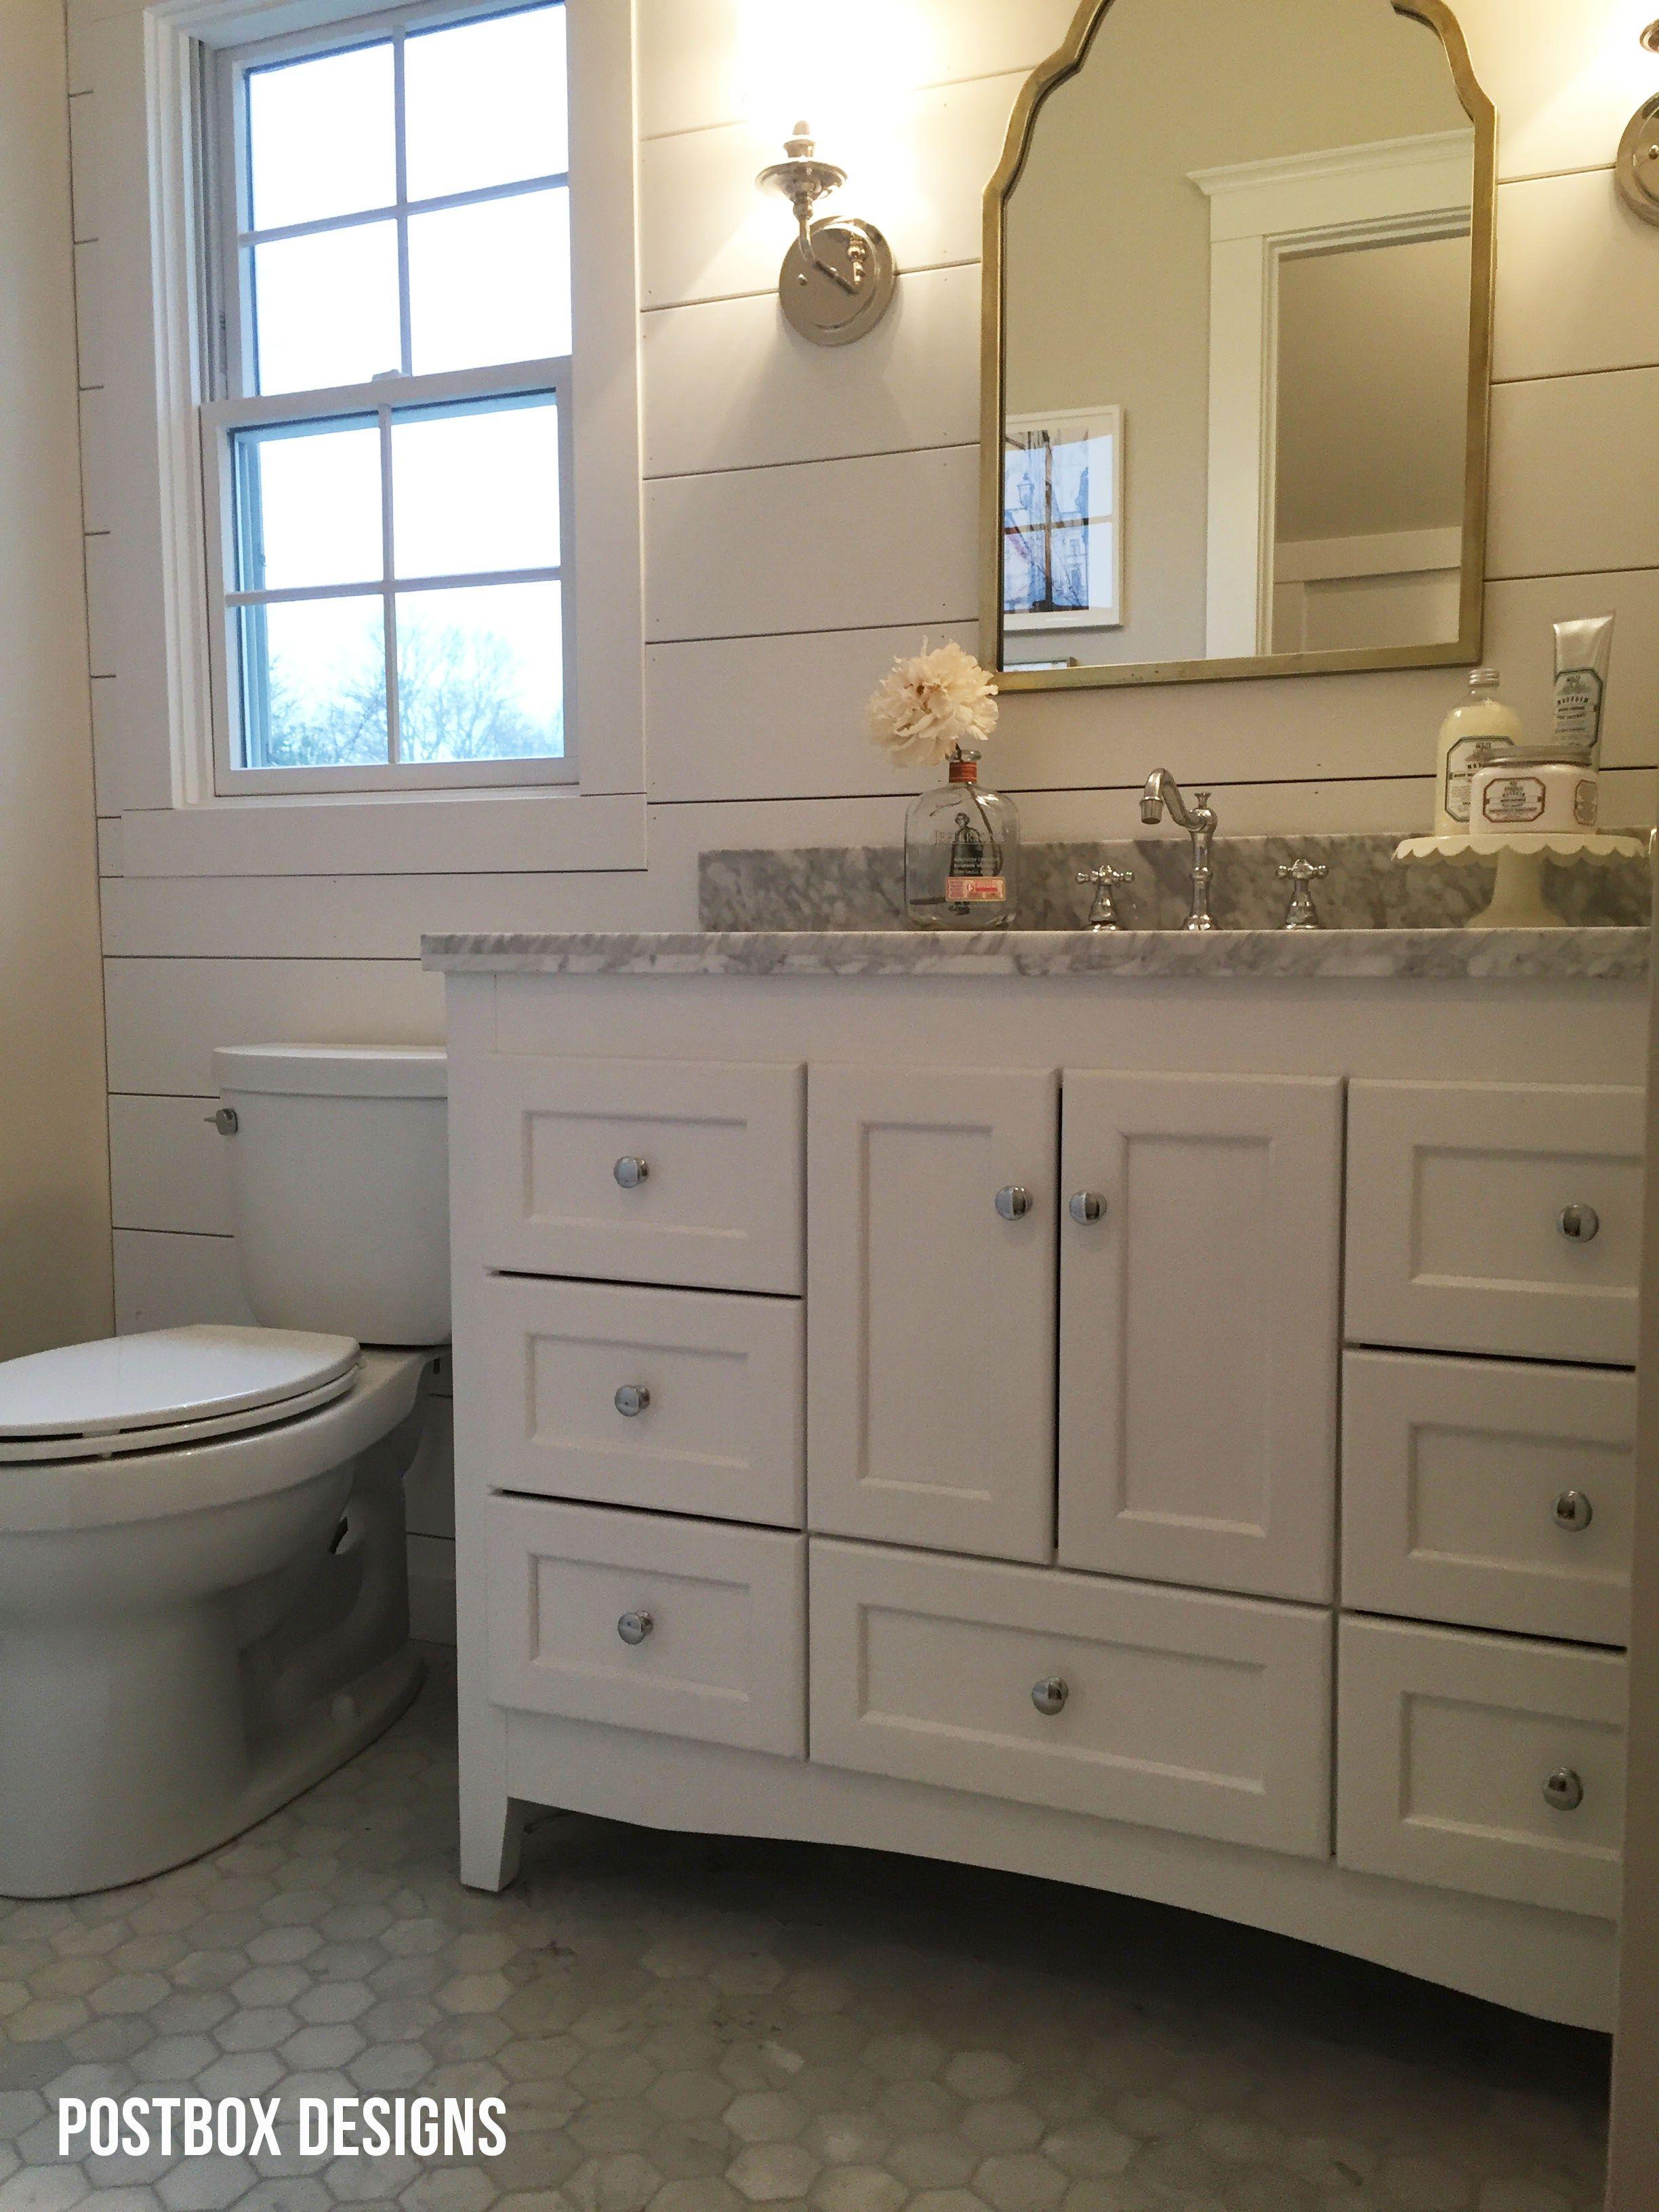 update a builder basic bathroom - Basic Bathroom Designs